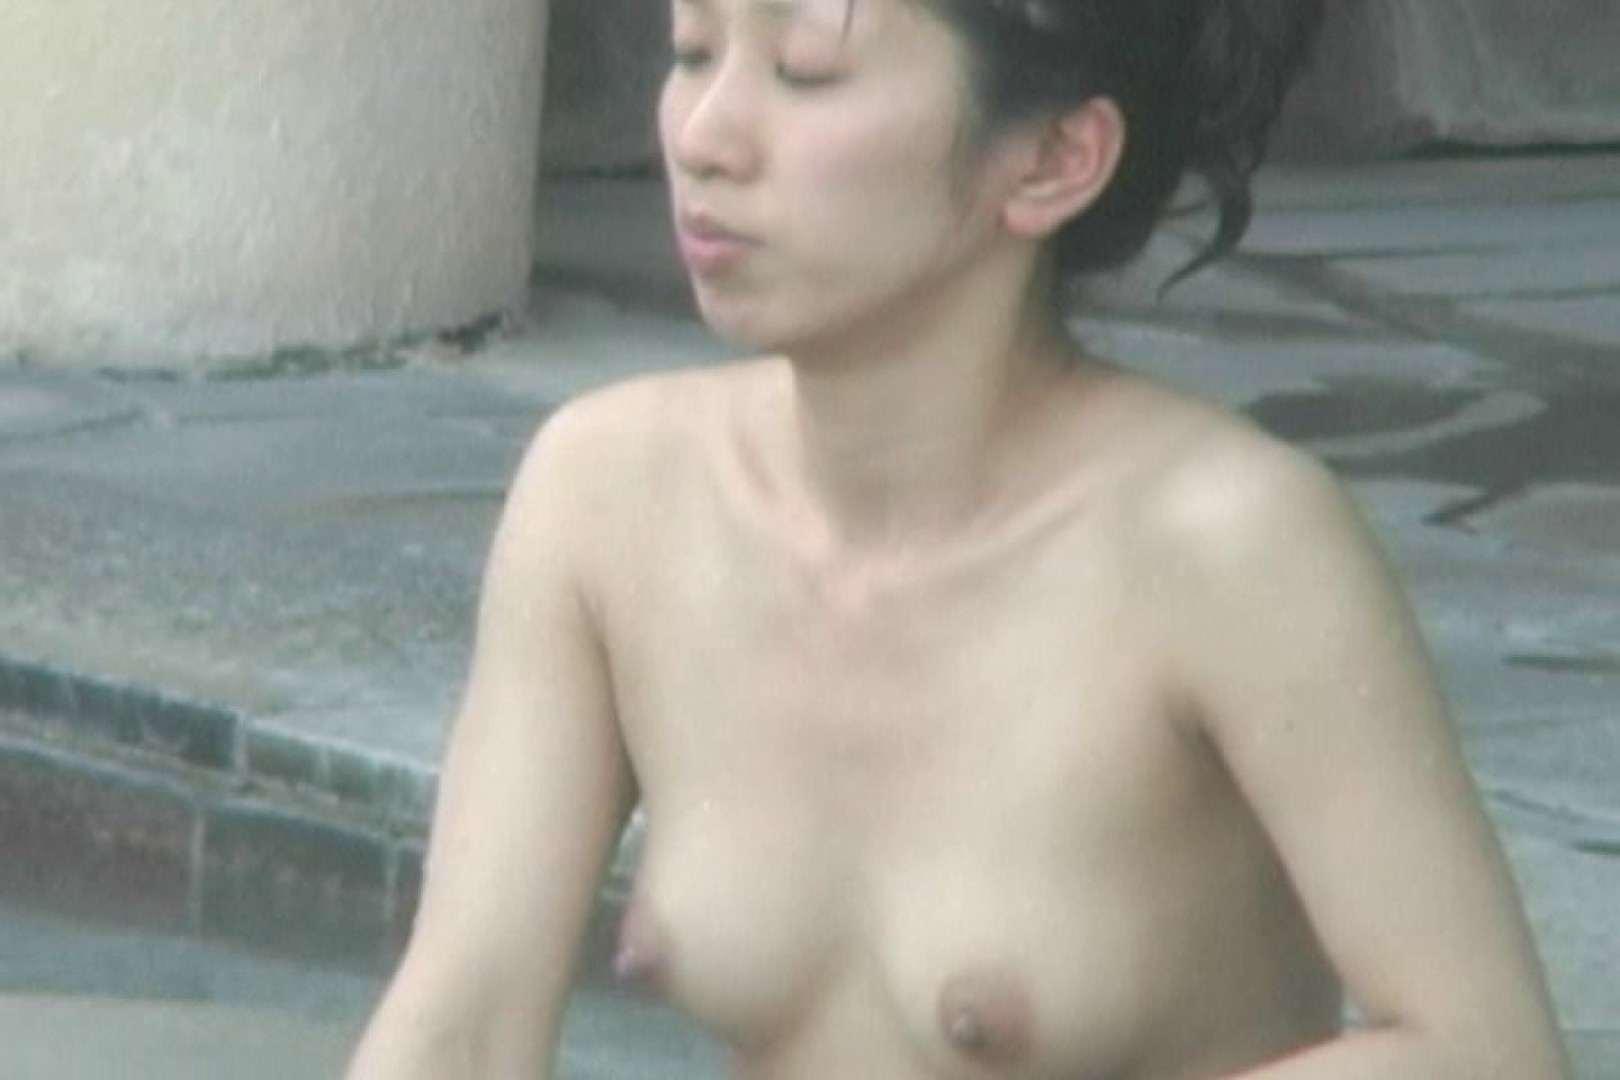 Aquaな露天風呂Vol.588 いやらしいOL 盗撮画像 41連発 37